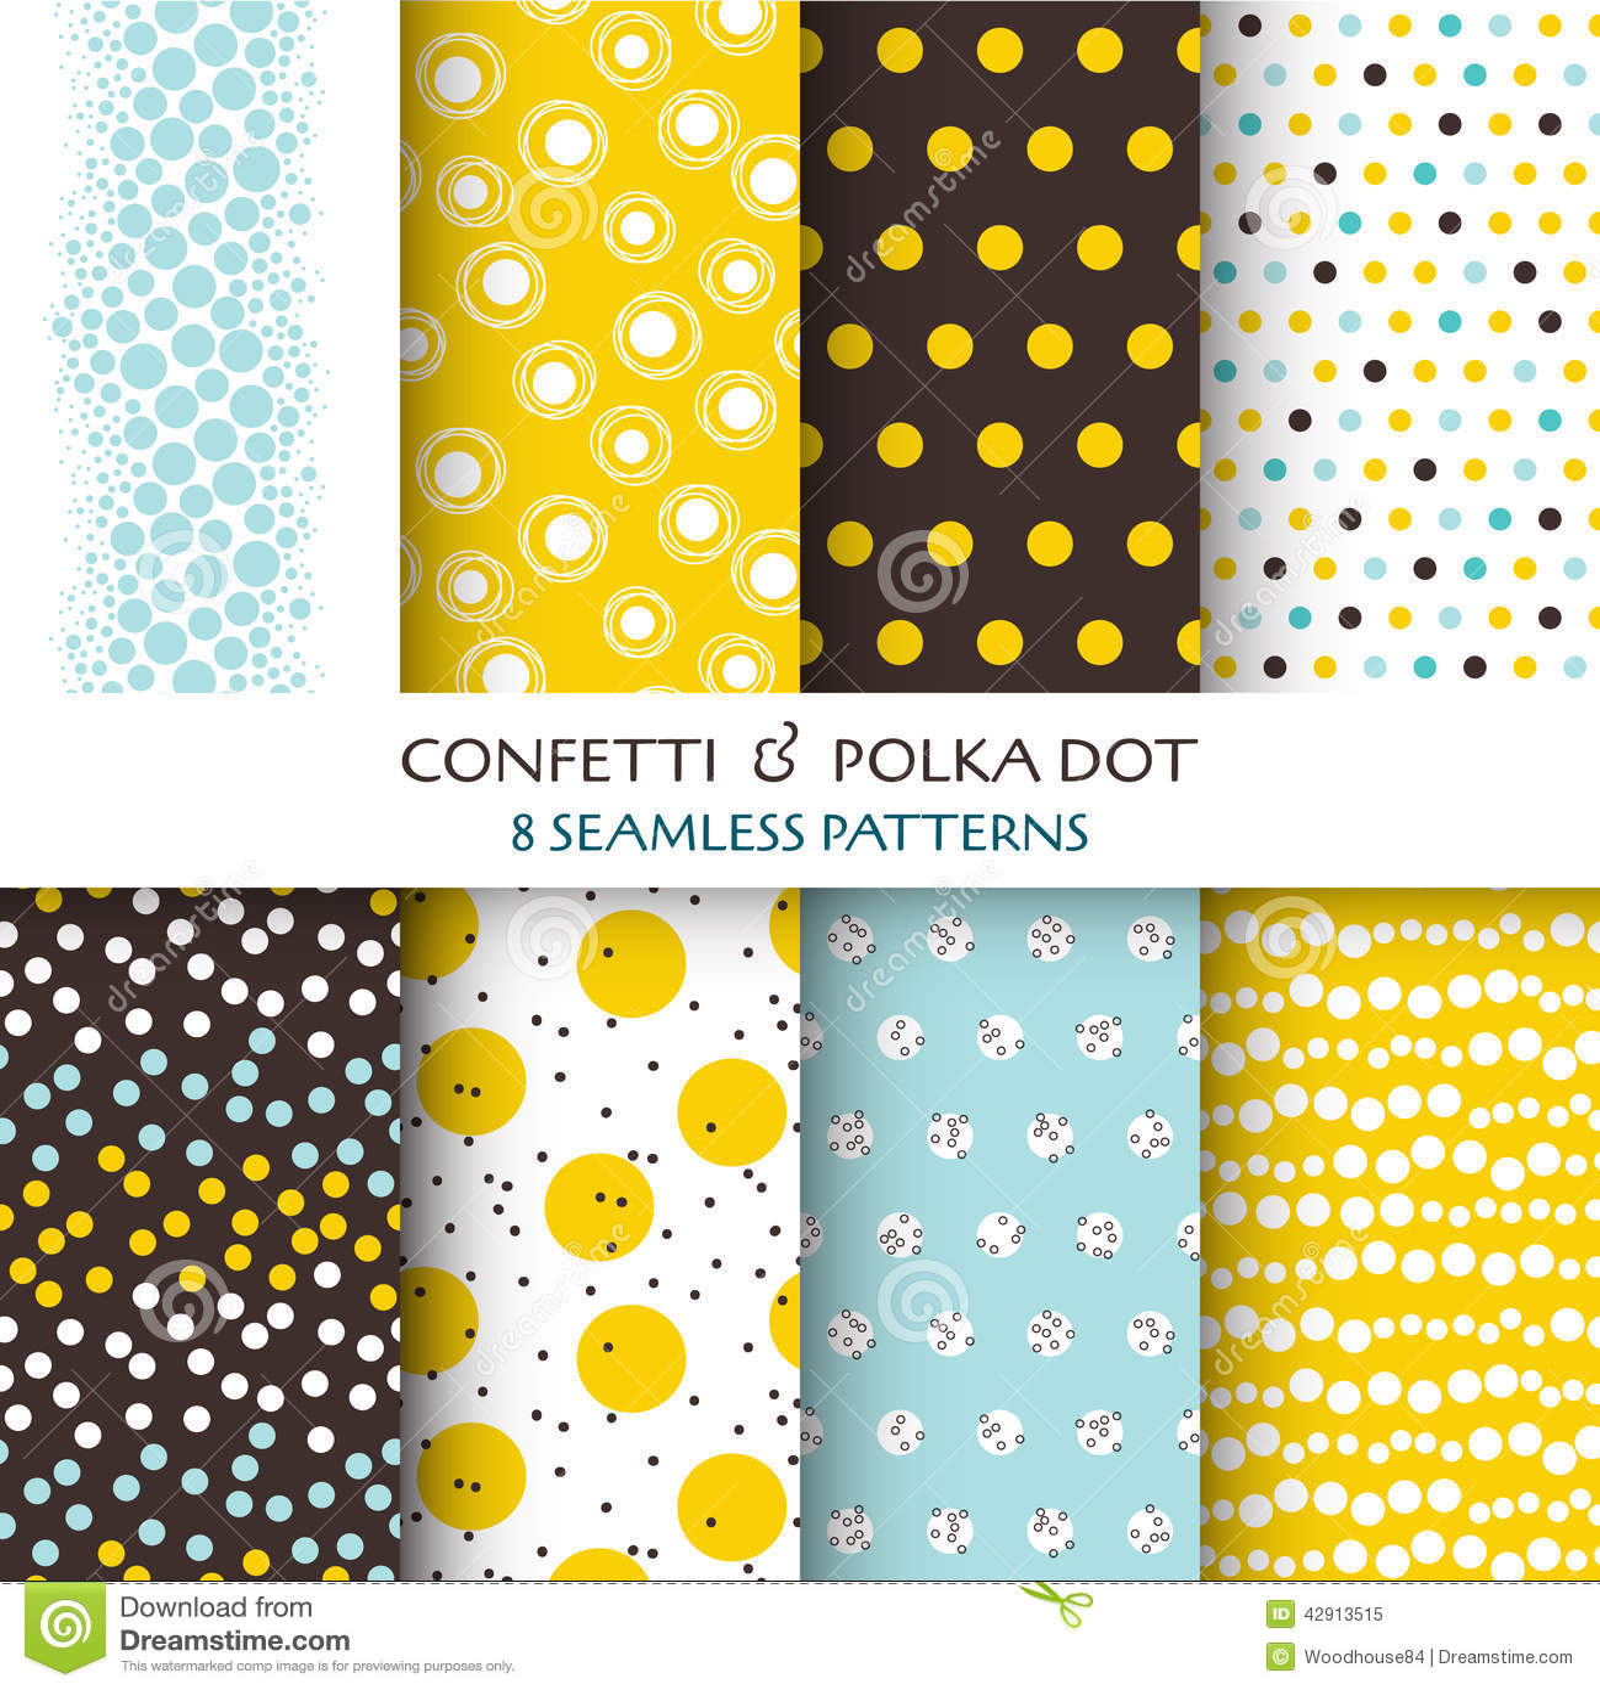 8 Seamless Patterns - Confetti and Polka Dot